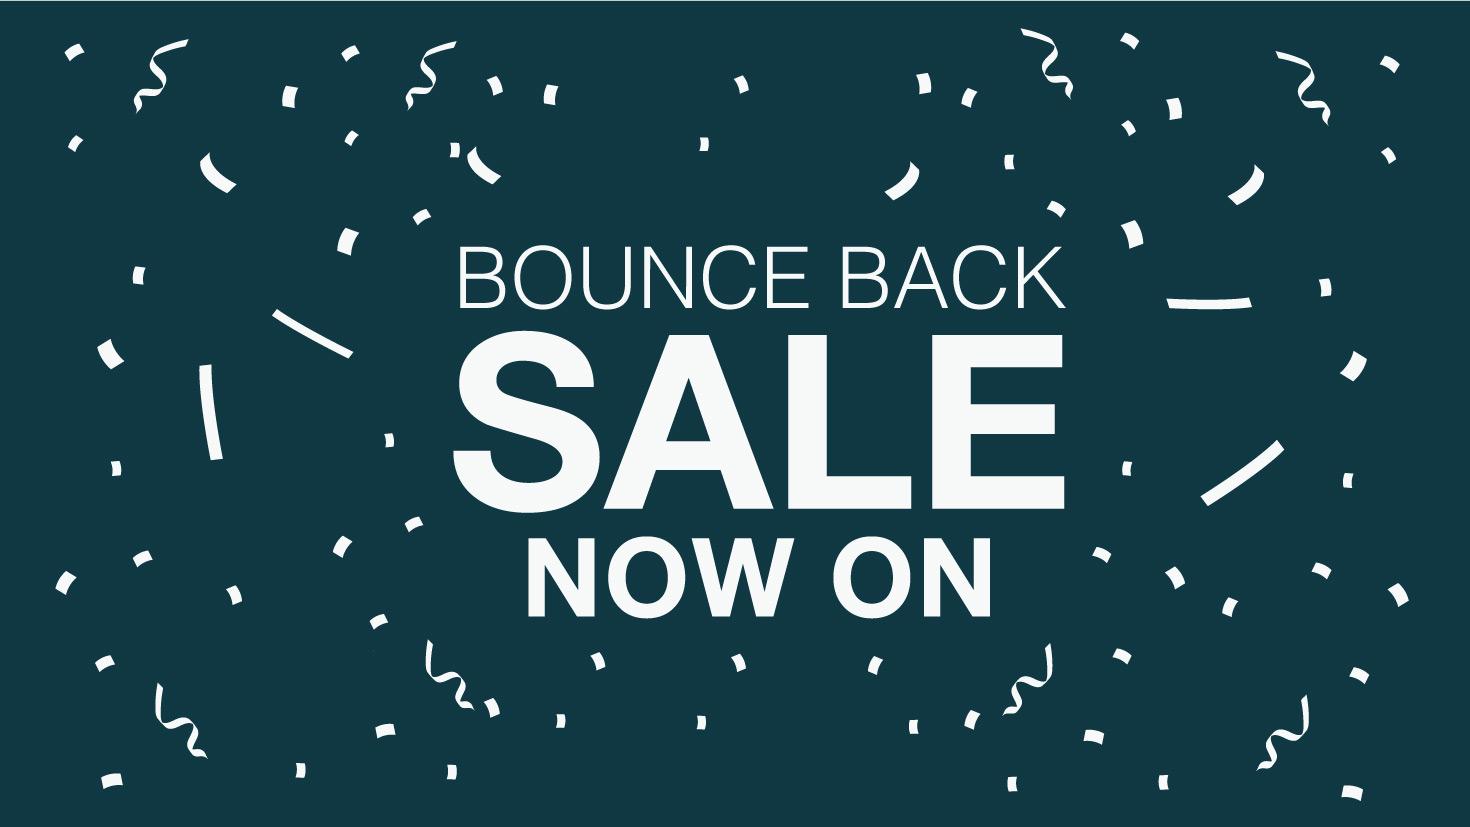 Bounce back sale!